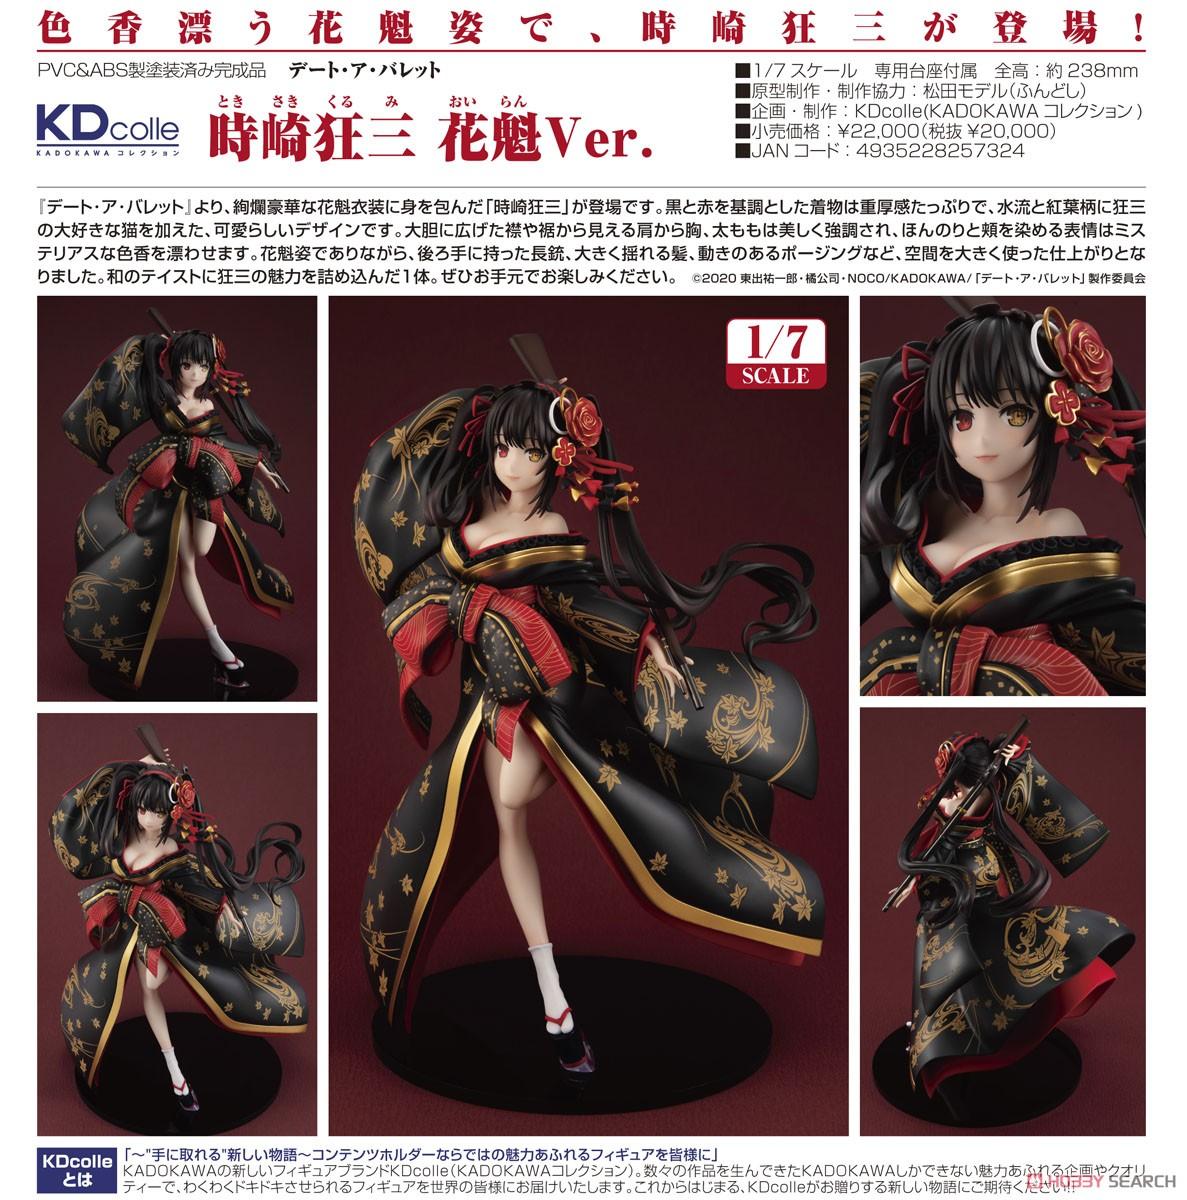 KDcolle『時崎狂三 花魁Ver.』デート・ア・バレット 1/7 完成品フィギュア-008